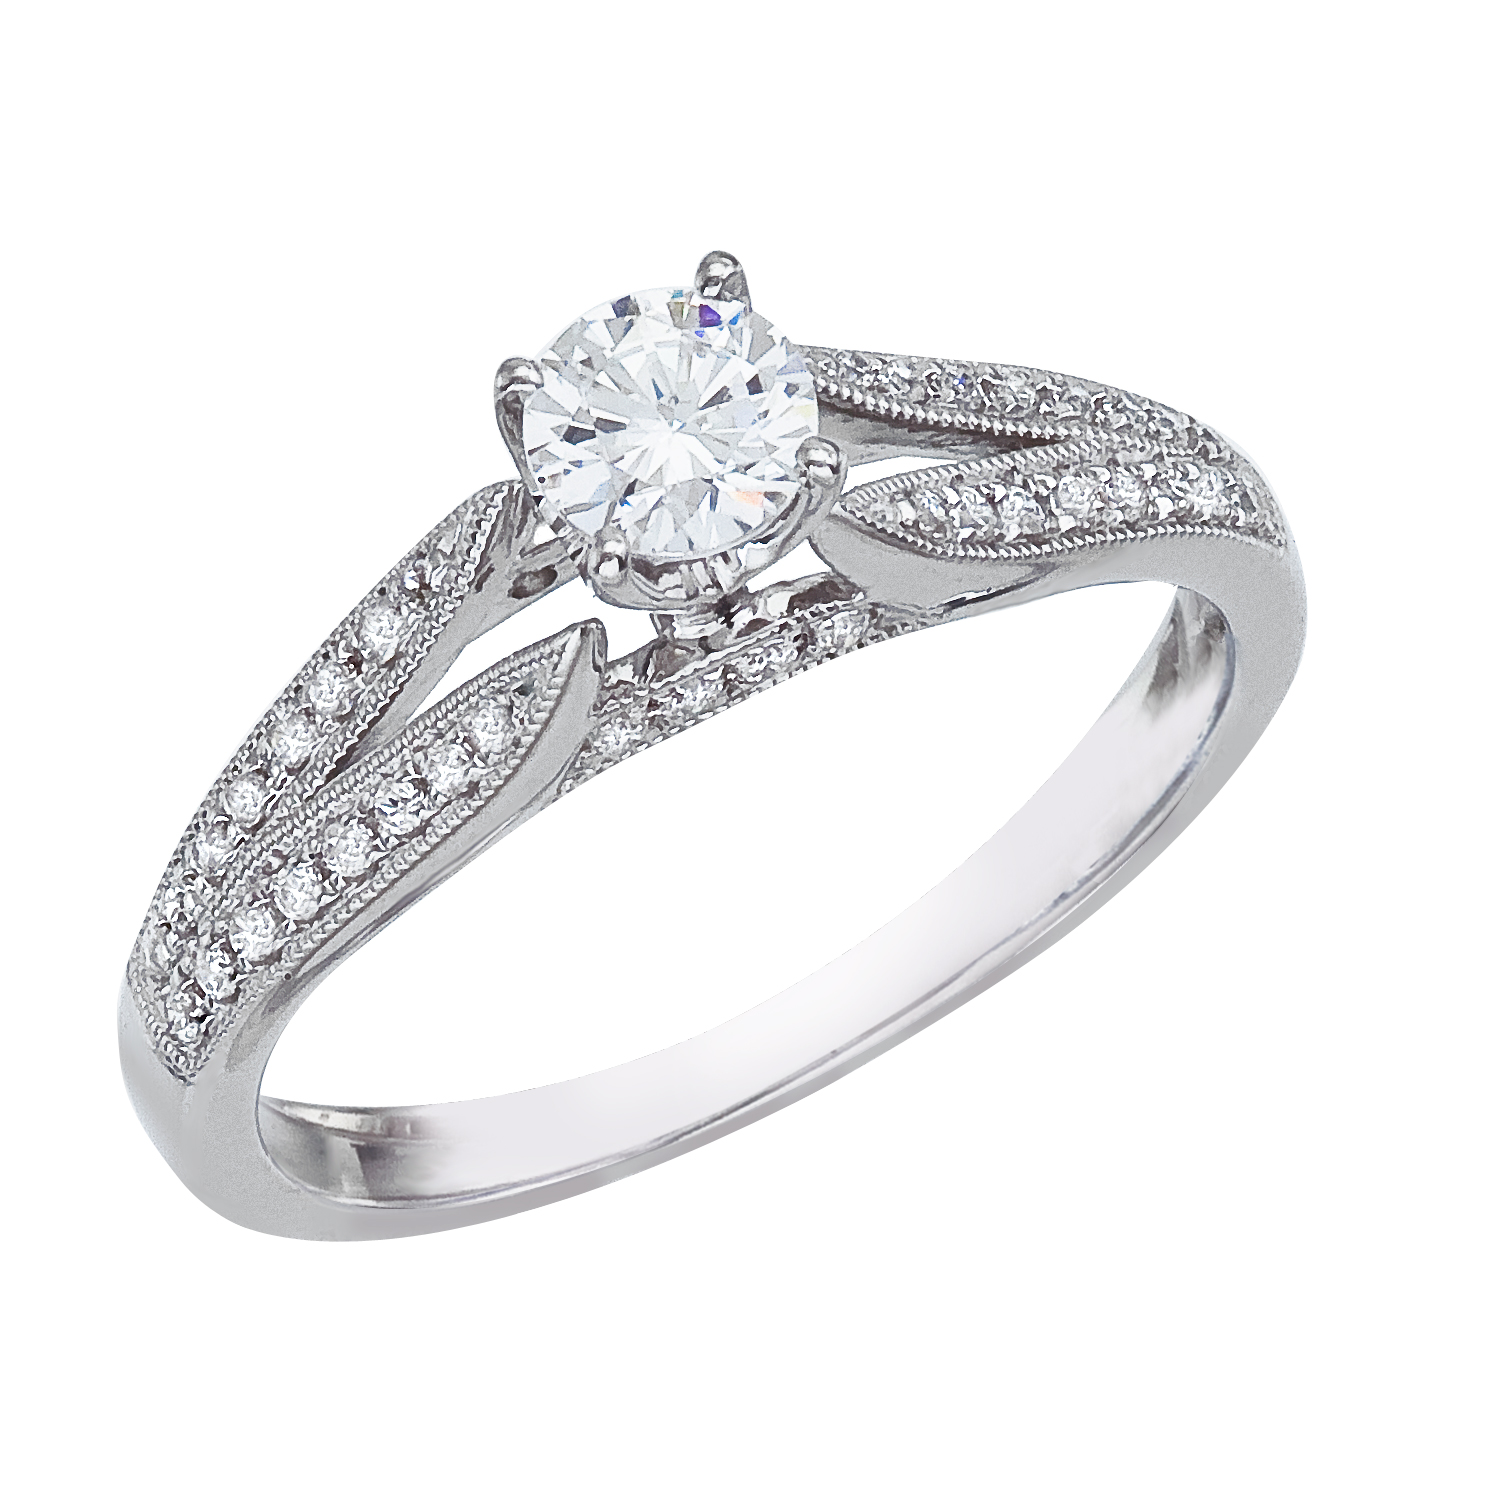 14k White gold Princess Diamond QPID Engagement Ring (0.47 tcw)